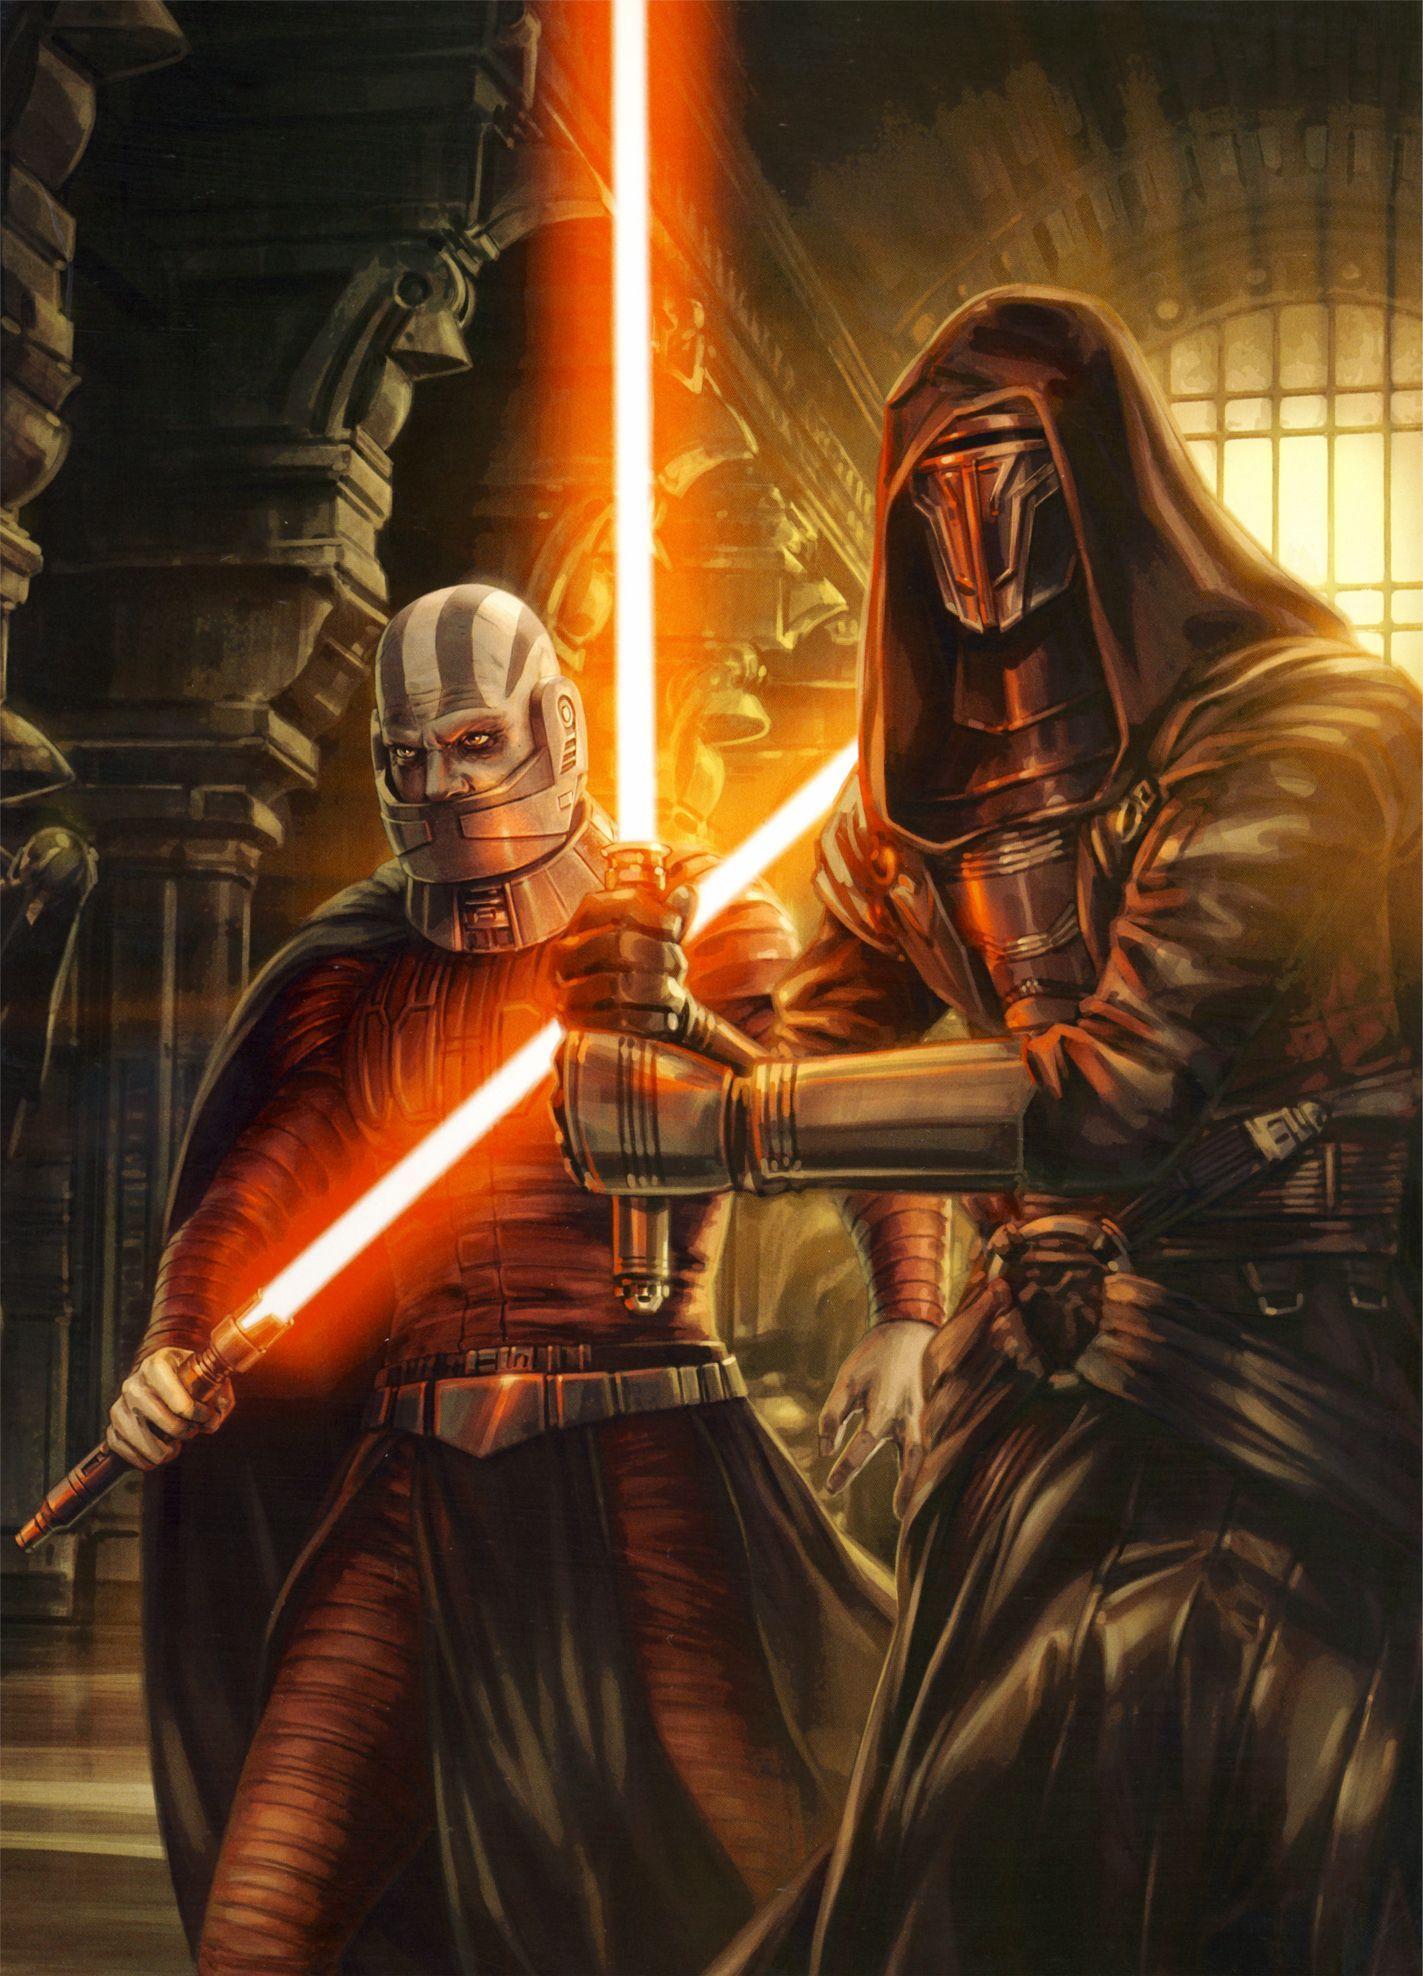 Star Wars Revan Wallpapers Top Free Star Wars Revan Backgrounds Wallpaperaccess